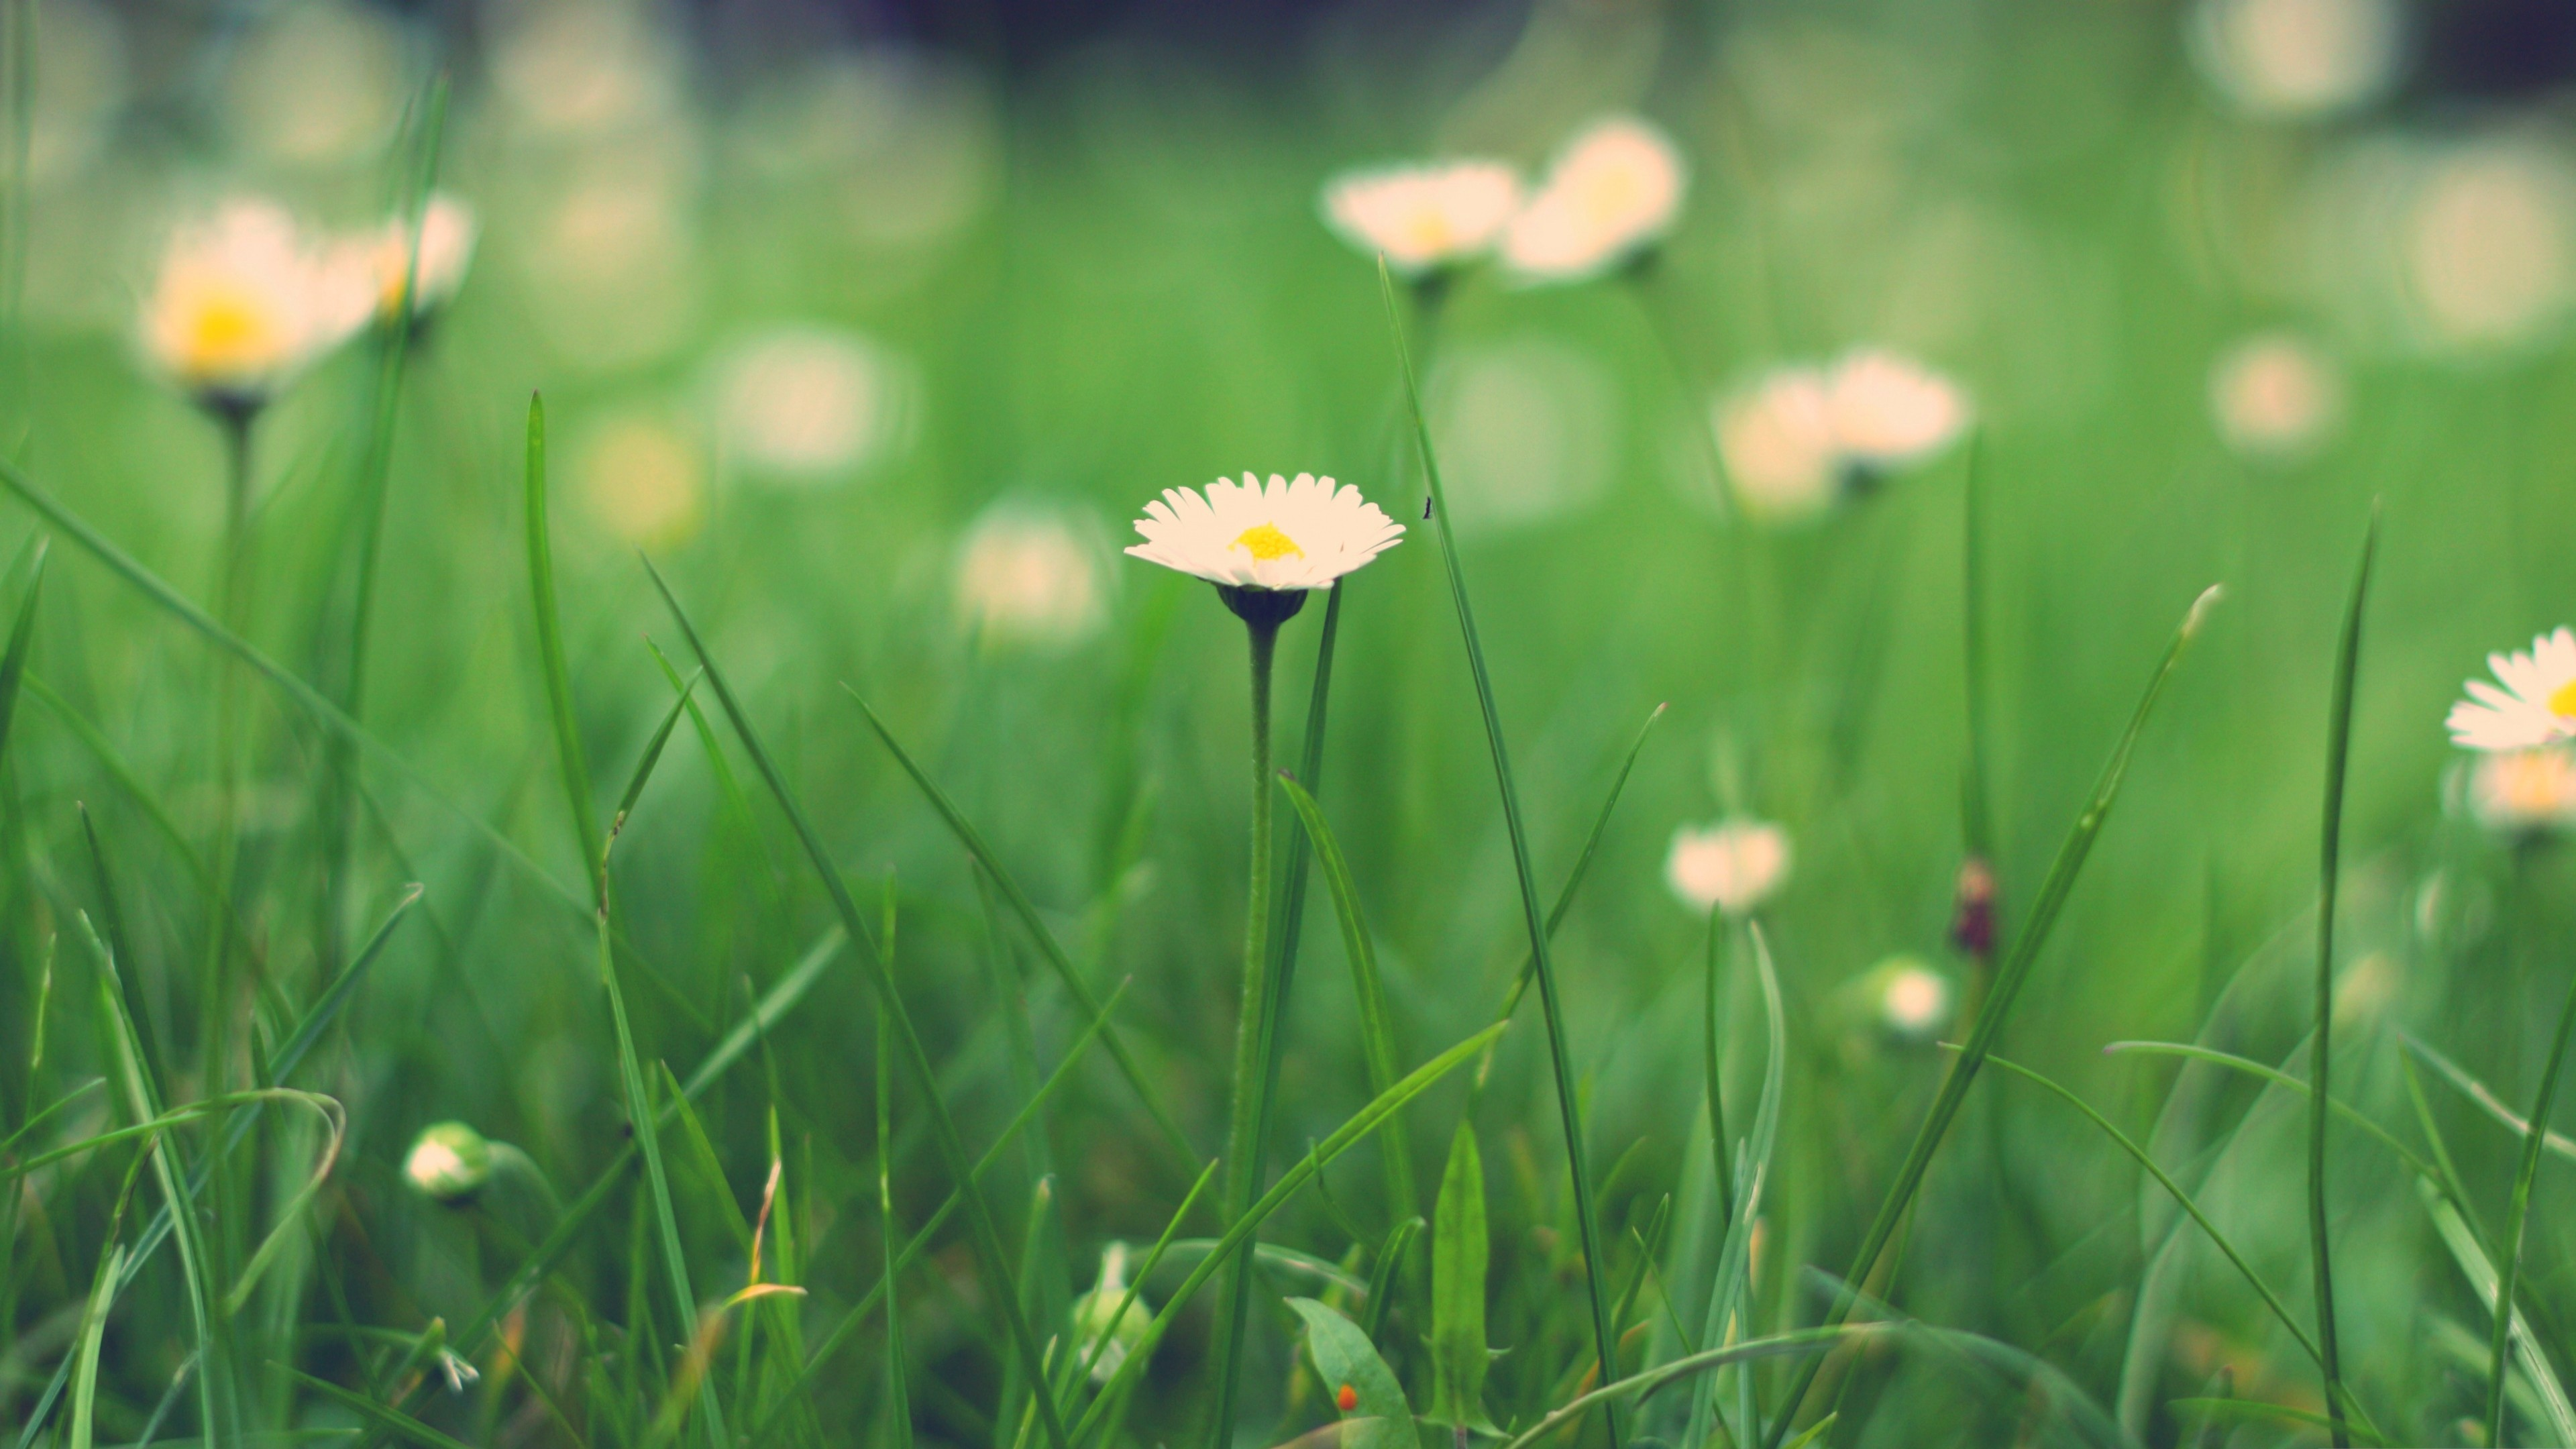 Green Green Meadow Wallpapers - WallpaperSafari